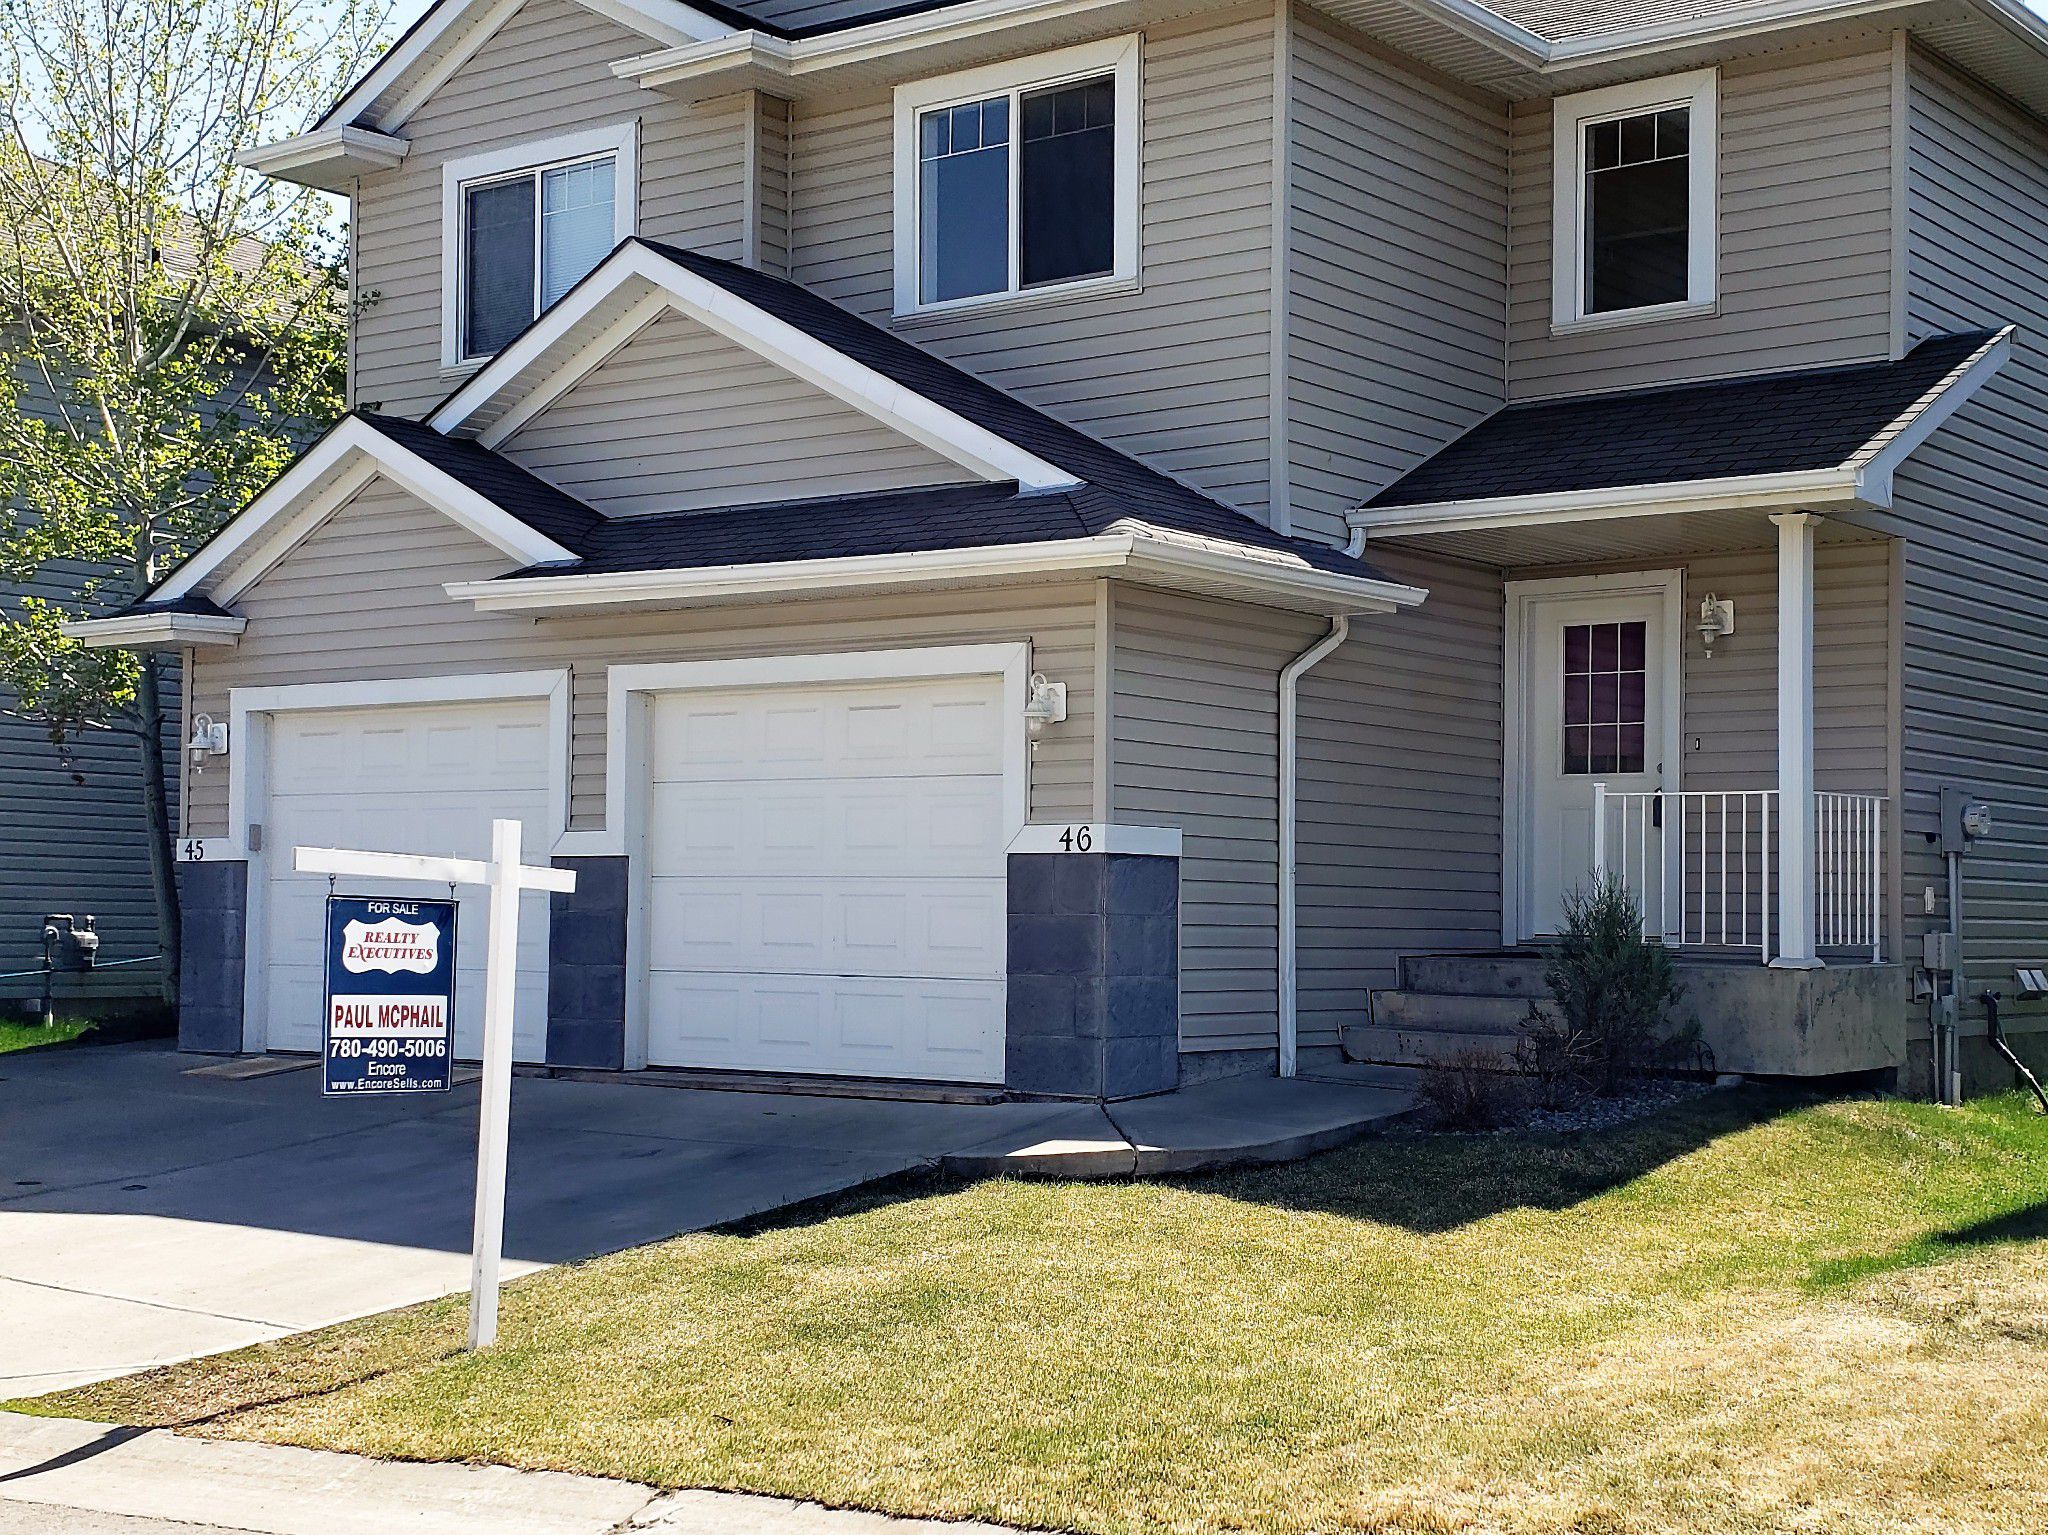 Main Photo: 46 287 MacEwan Road: Townhouse for sale (Edmonton)  : MLS®# e4156658